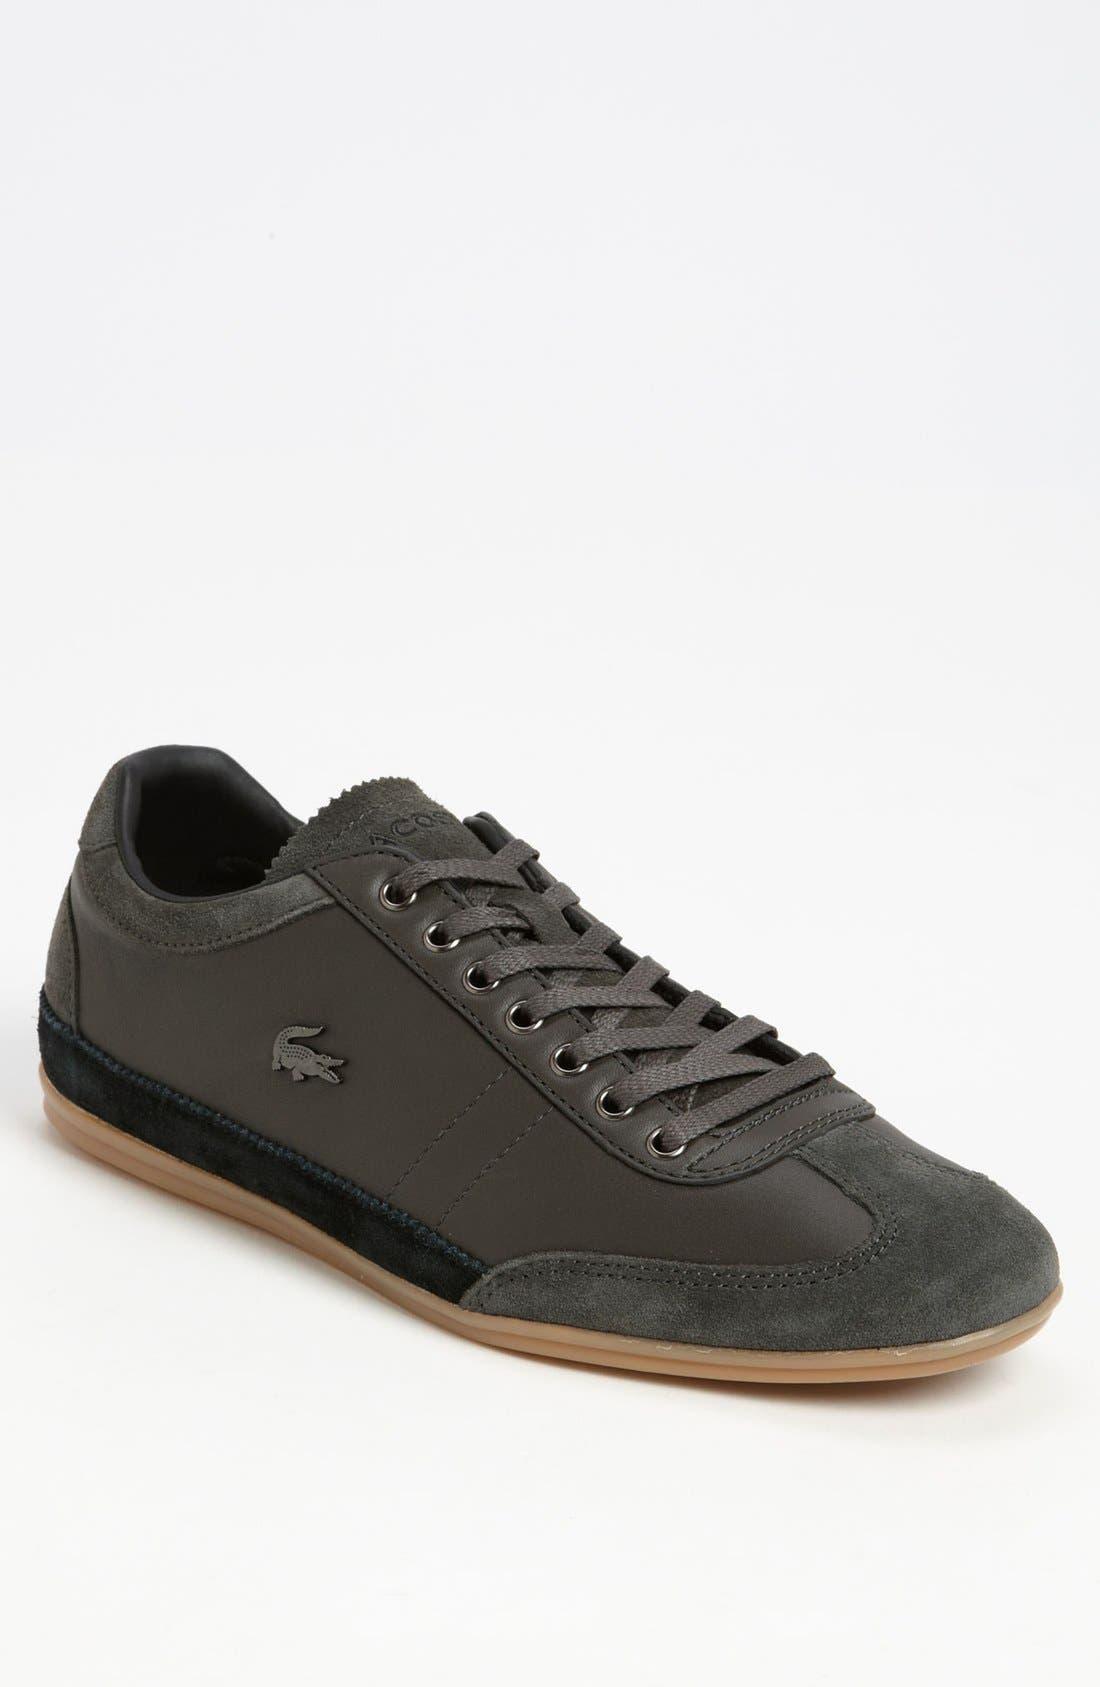 Alternate Image 1 Selected - Lacoste 'Misano 15' Sneaker (Men)